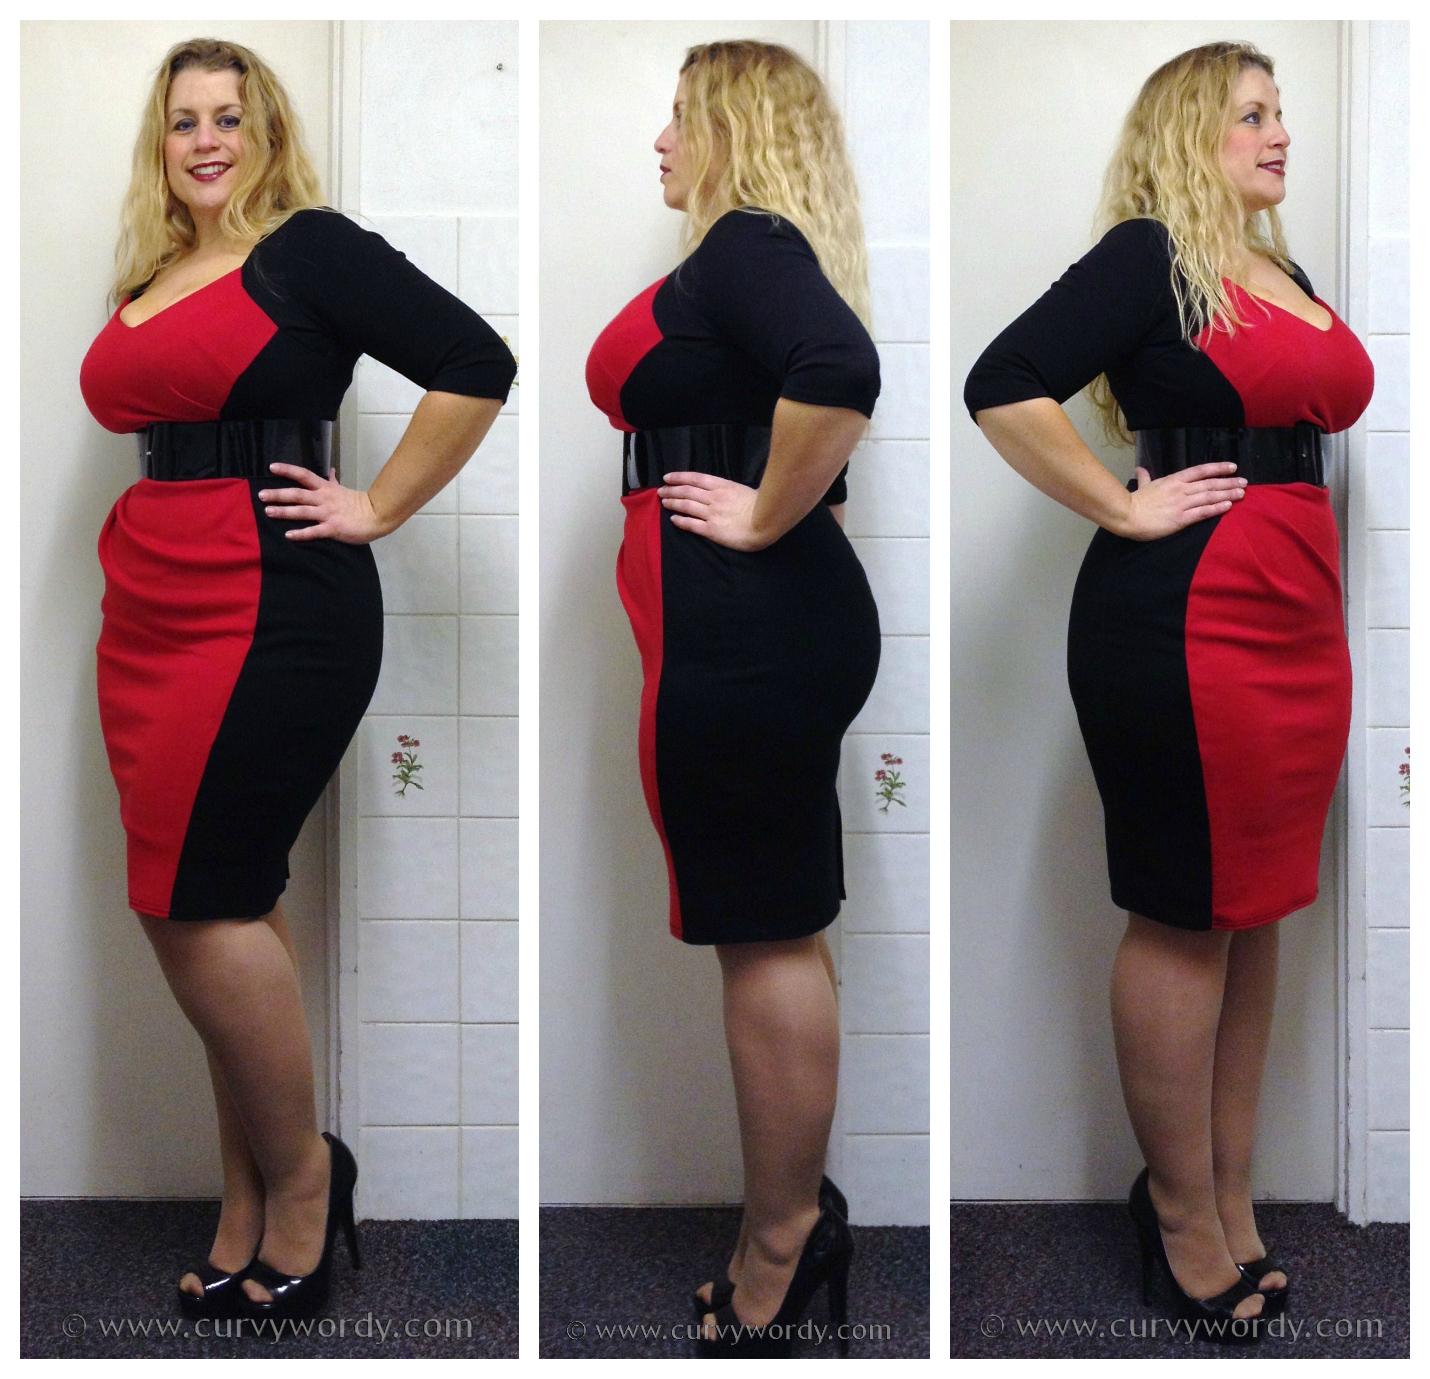 The Frisky Commute Frivolous Dress Order | redheads | Pinterest ...